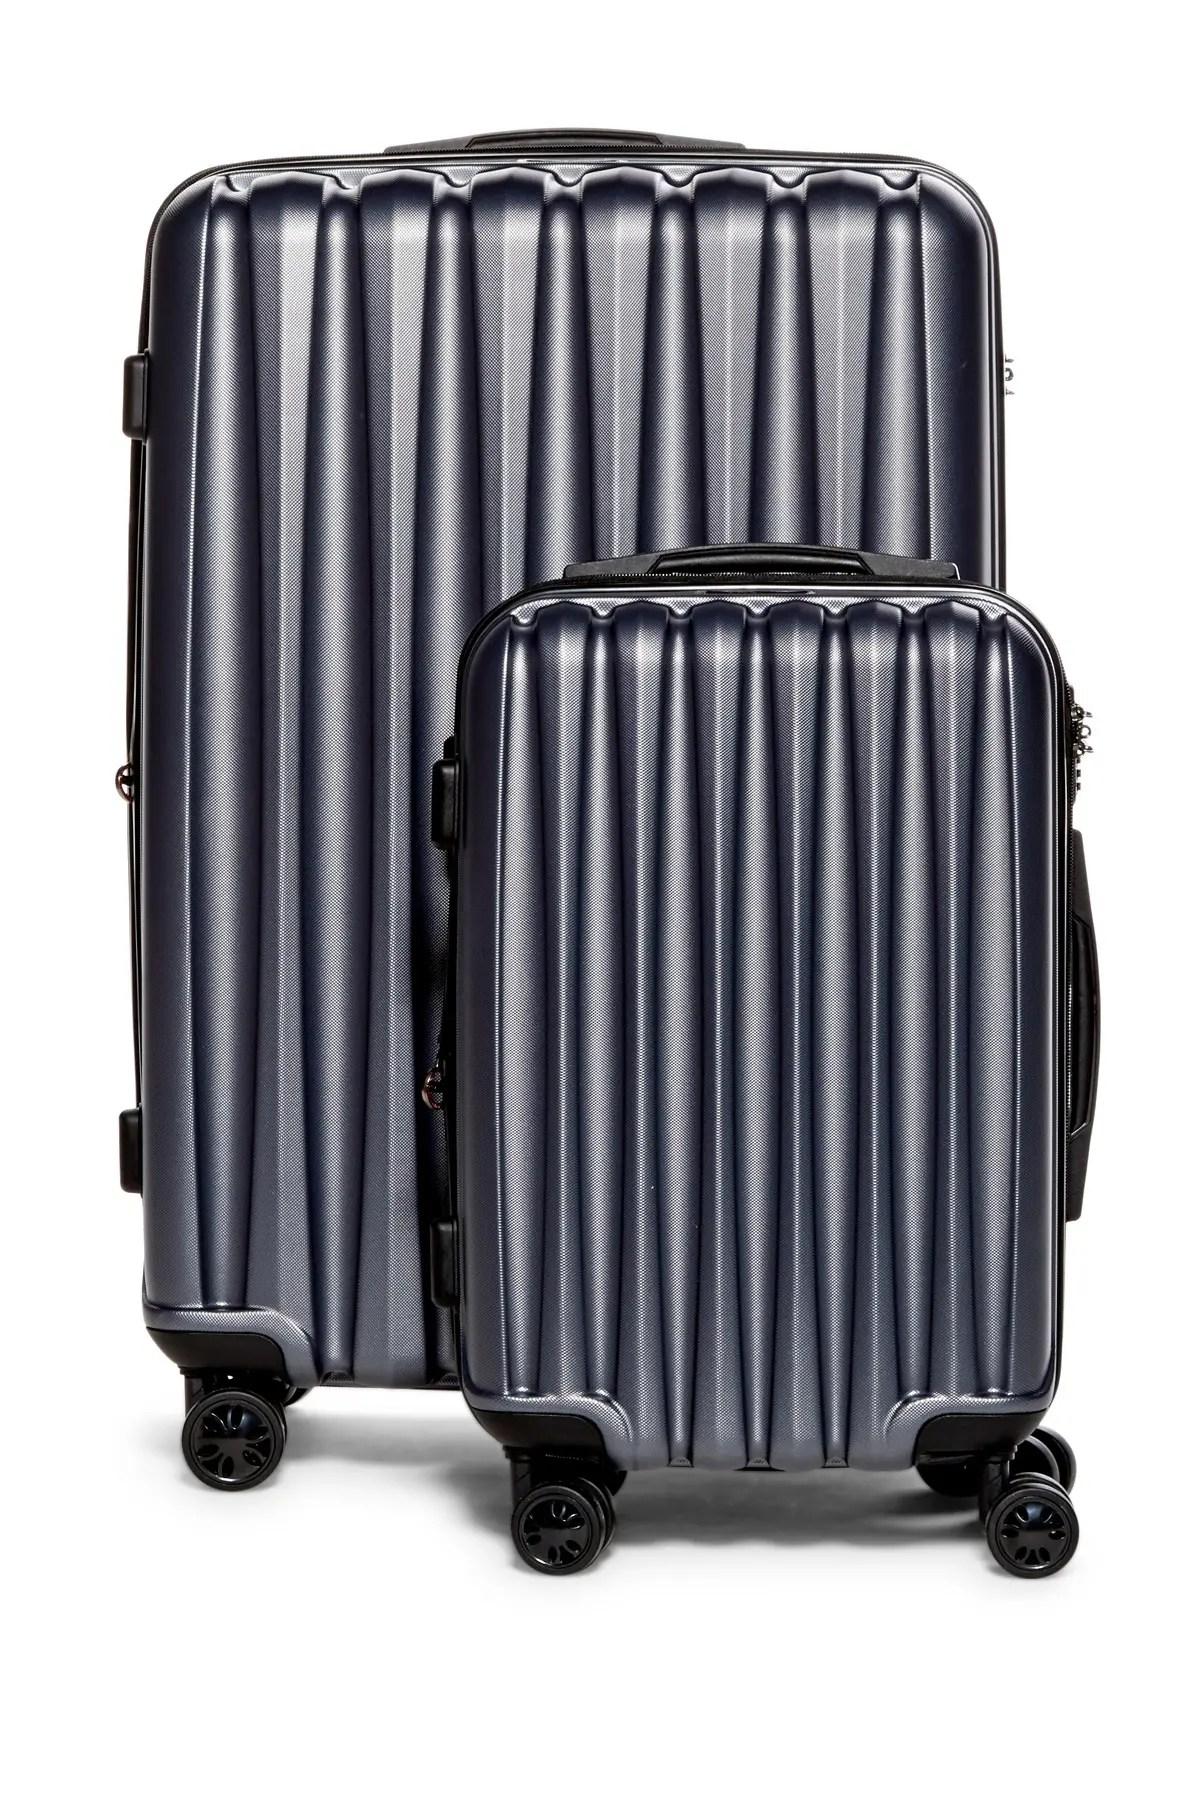 calpak luggage verdugo 2 piece spinner luggage set nordstrom rack